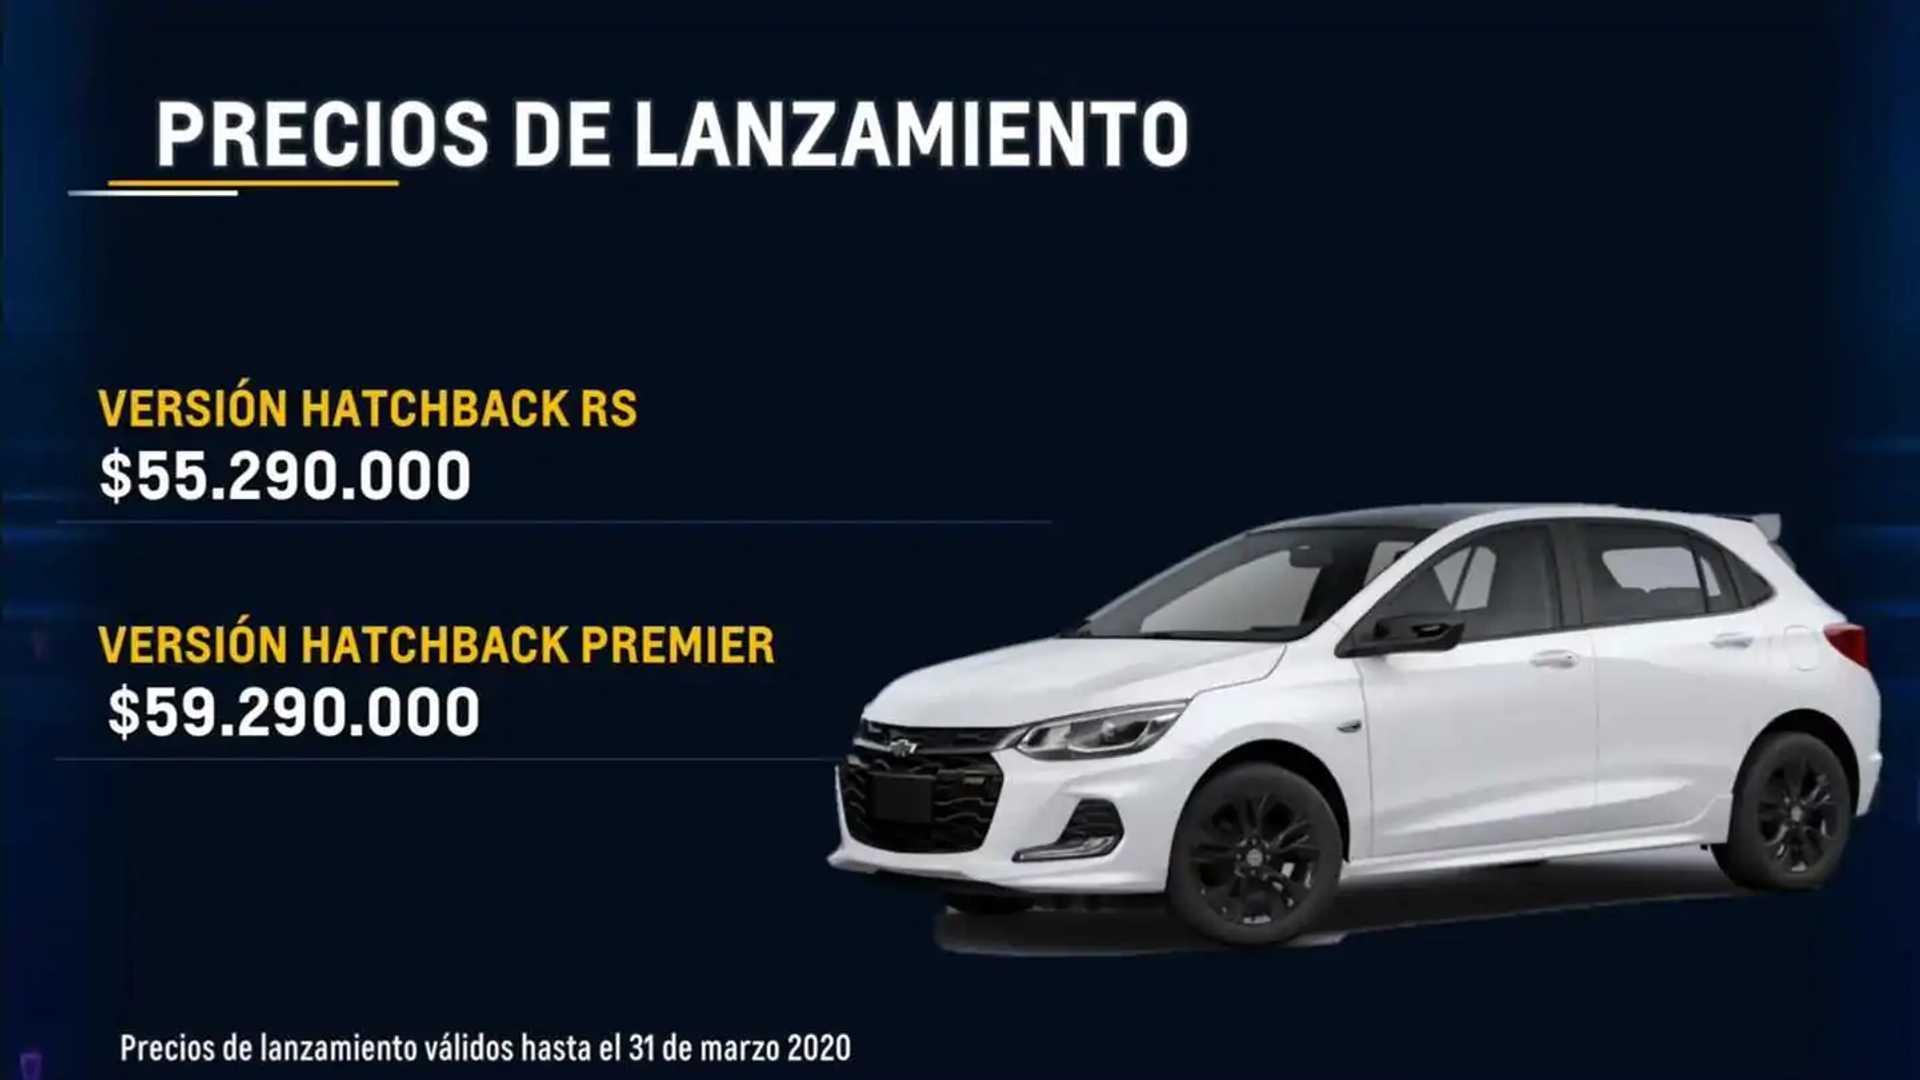 Novo Chevrolet Onix Rs 2021 Estreia Por R 66 3 Mil Na Colombia